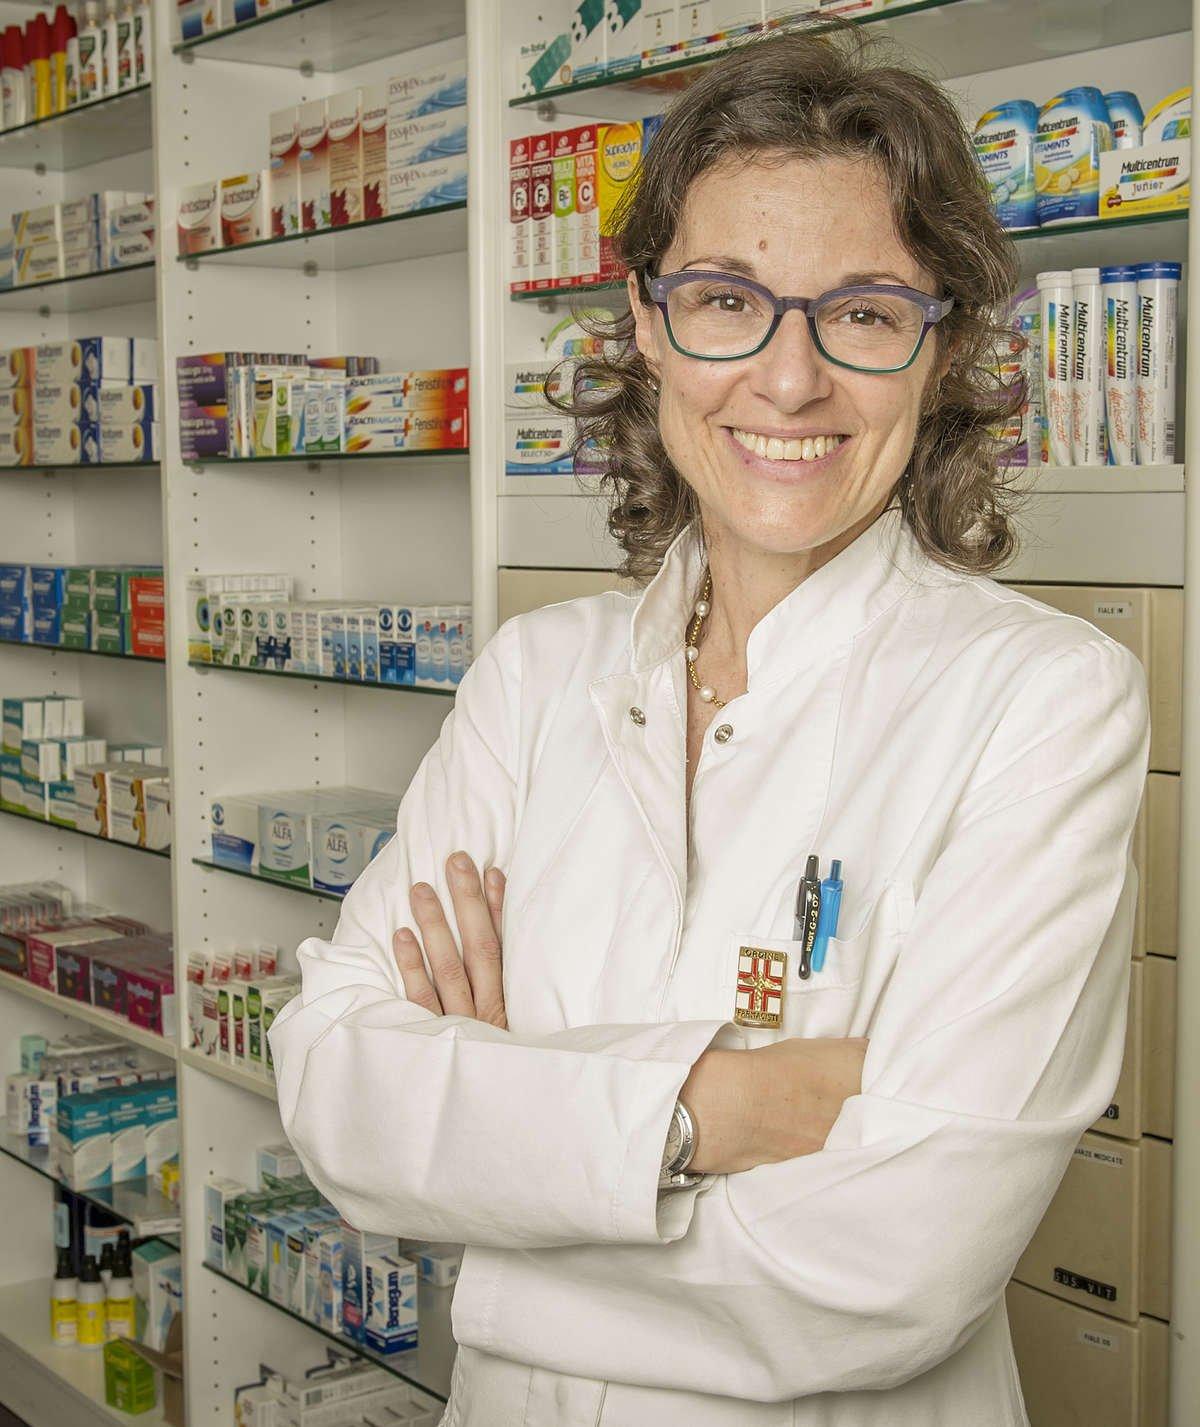 Paola Bevilacqua